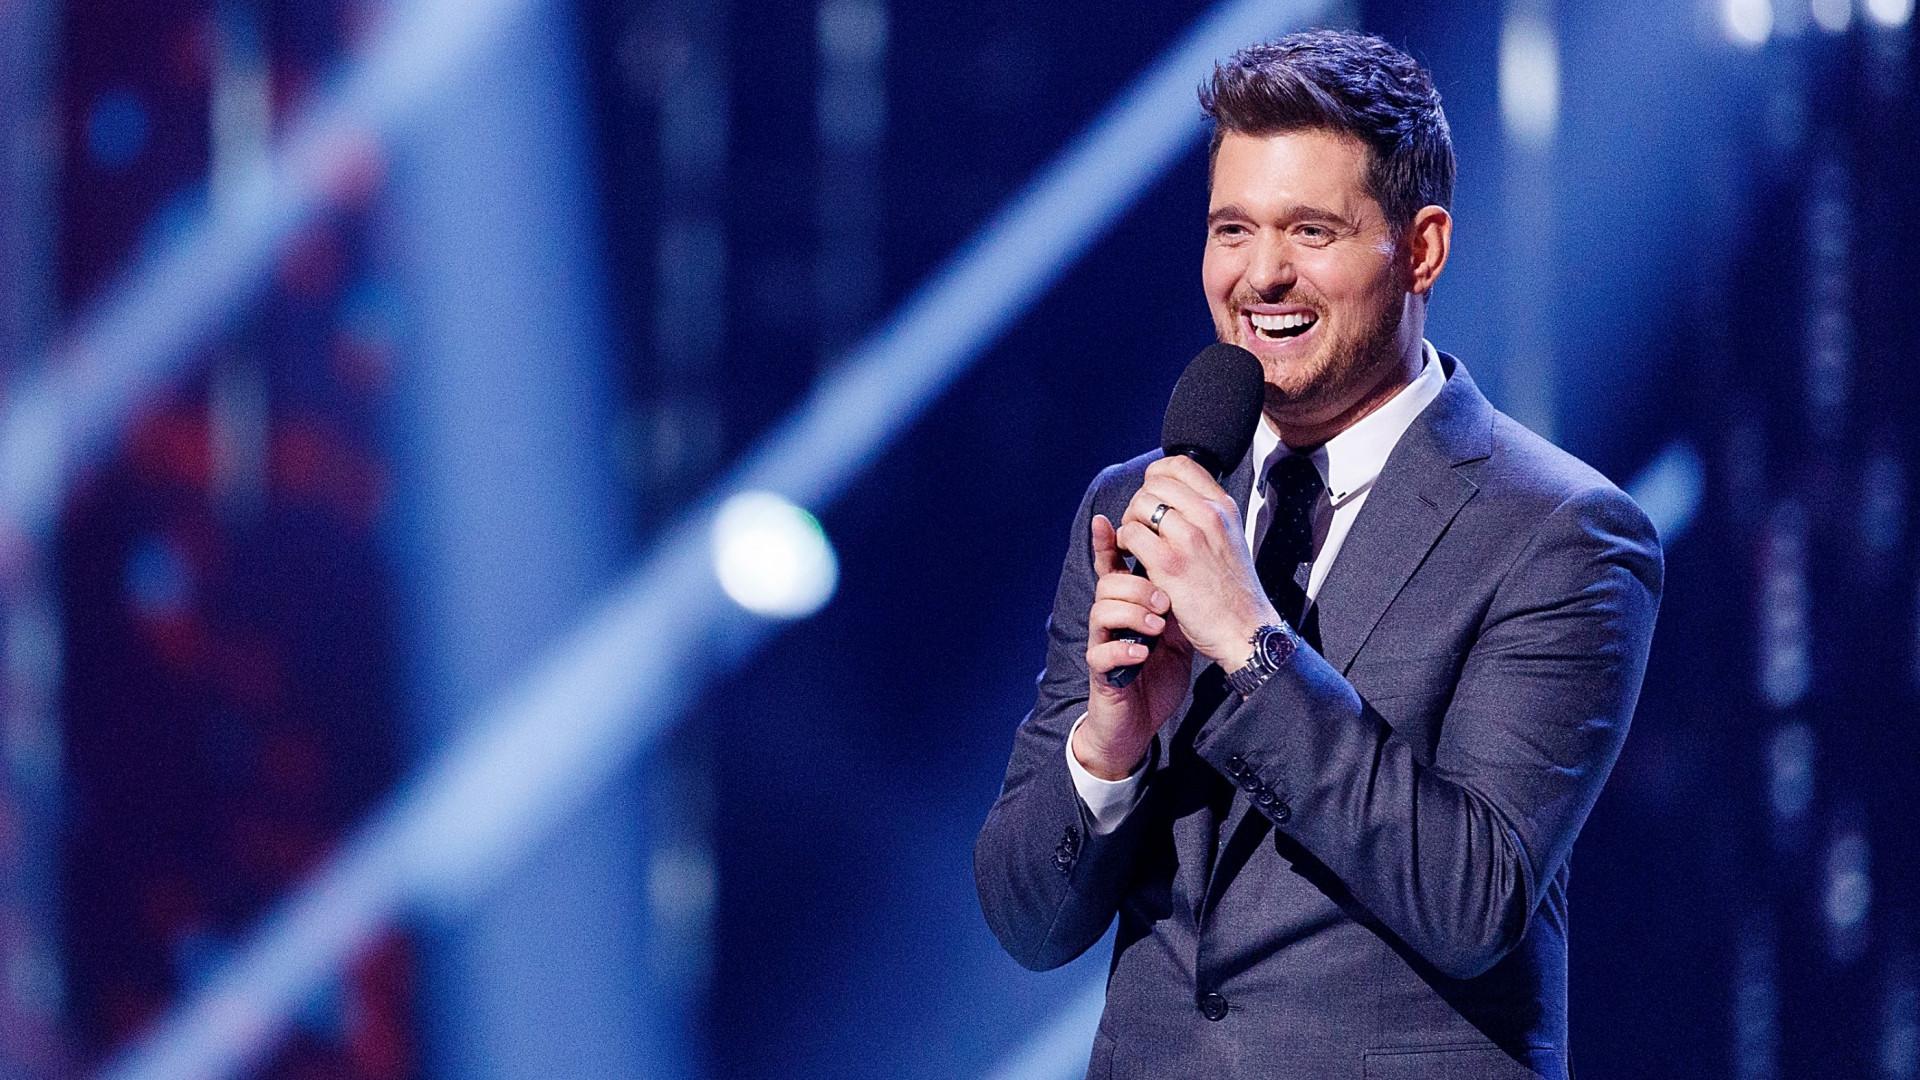 Michael Bublé regressa aos palcos após ultrapassar drama familiar